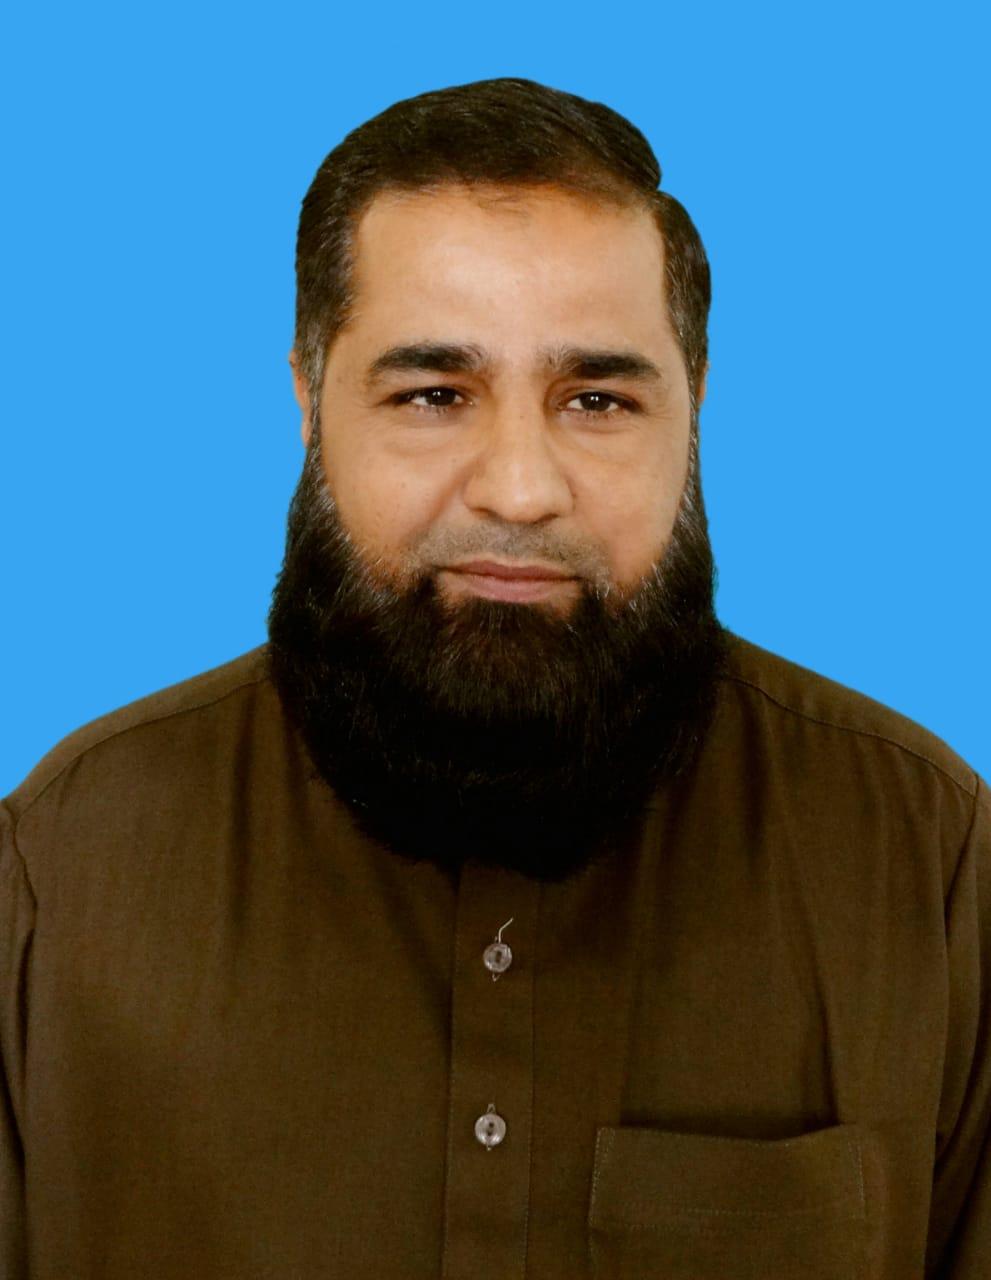 Qadeer Ahmed